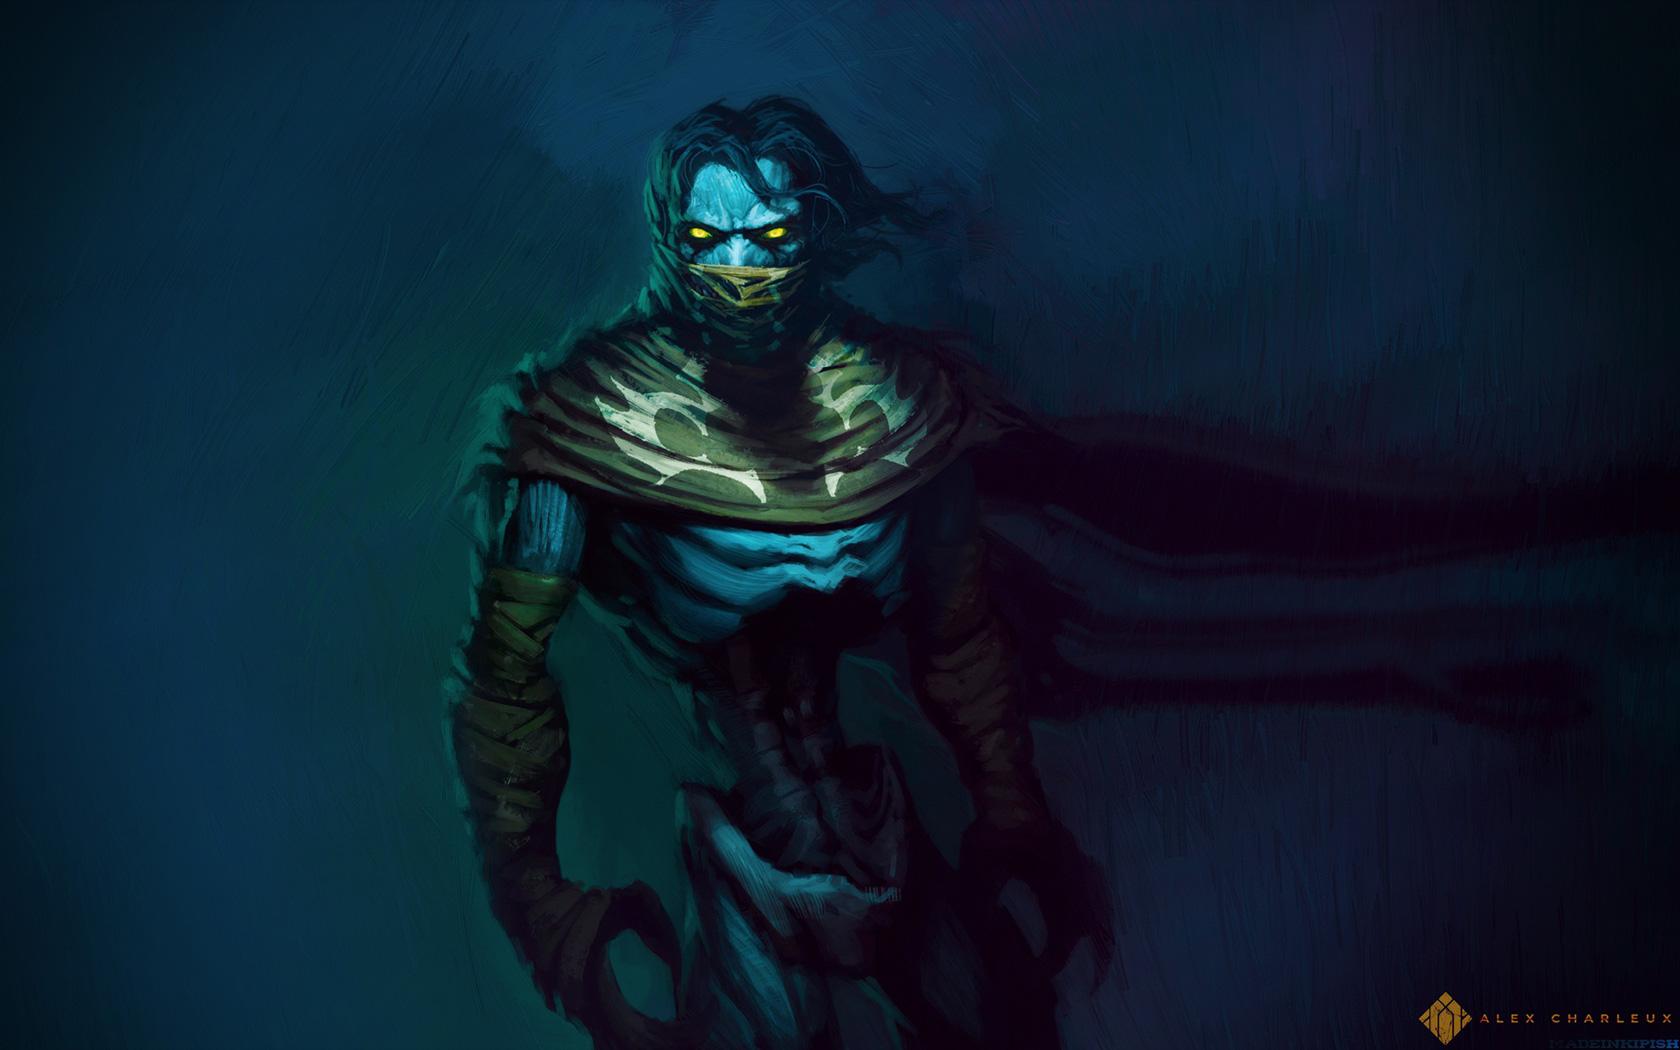 Free Legacy of Kain: Soul Reaver Wallpaper in 1680x1050